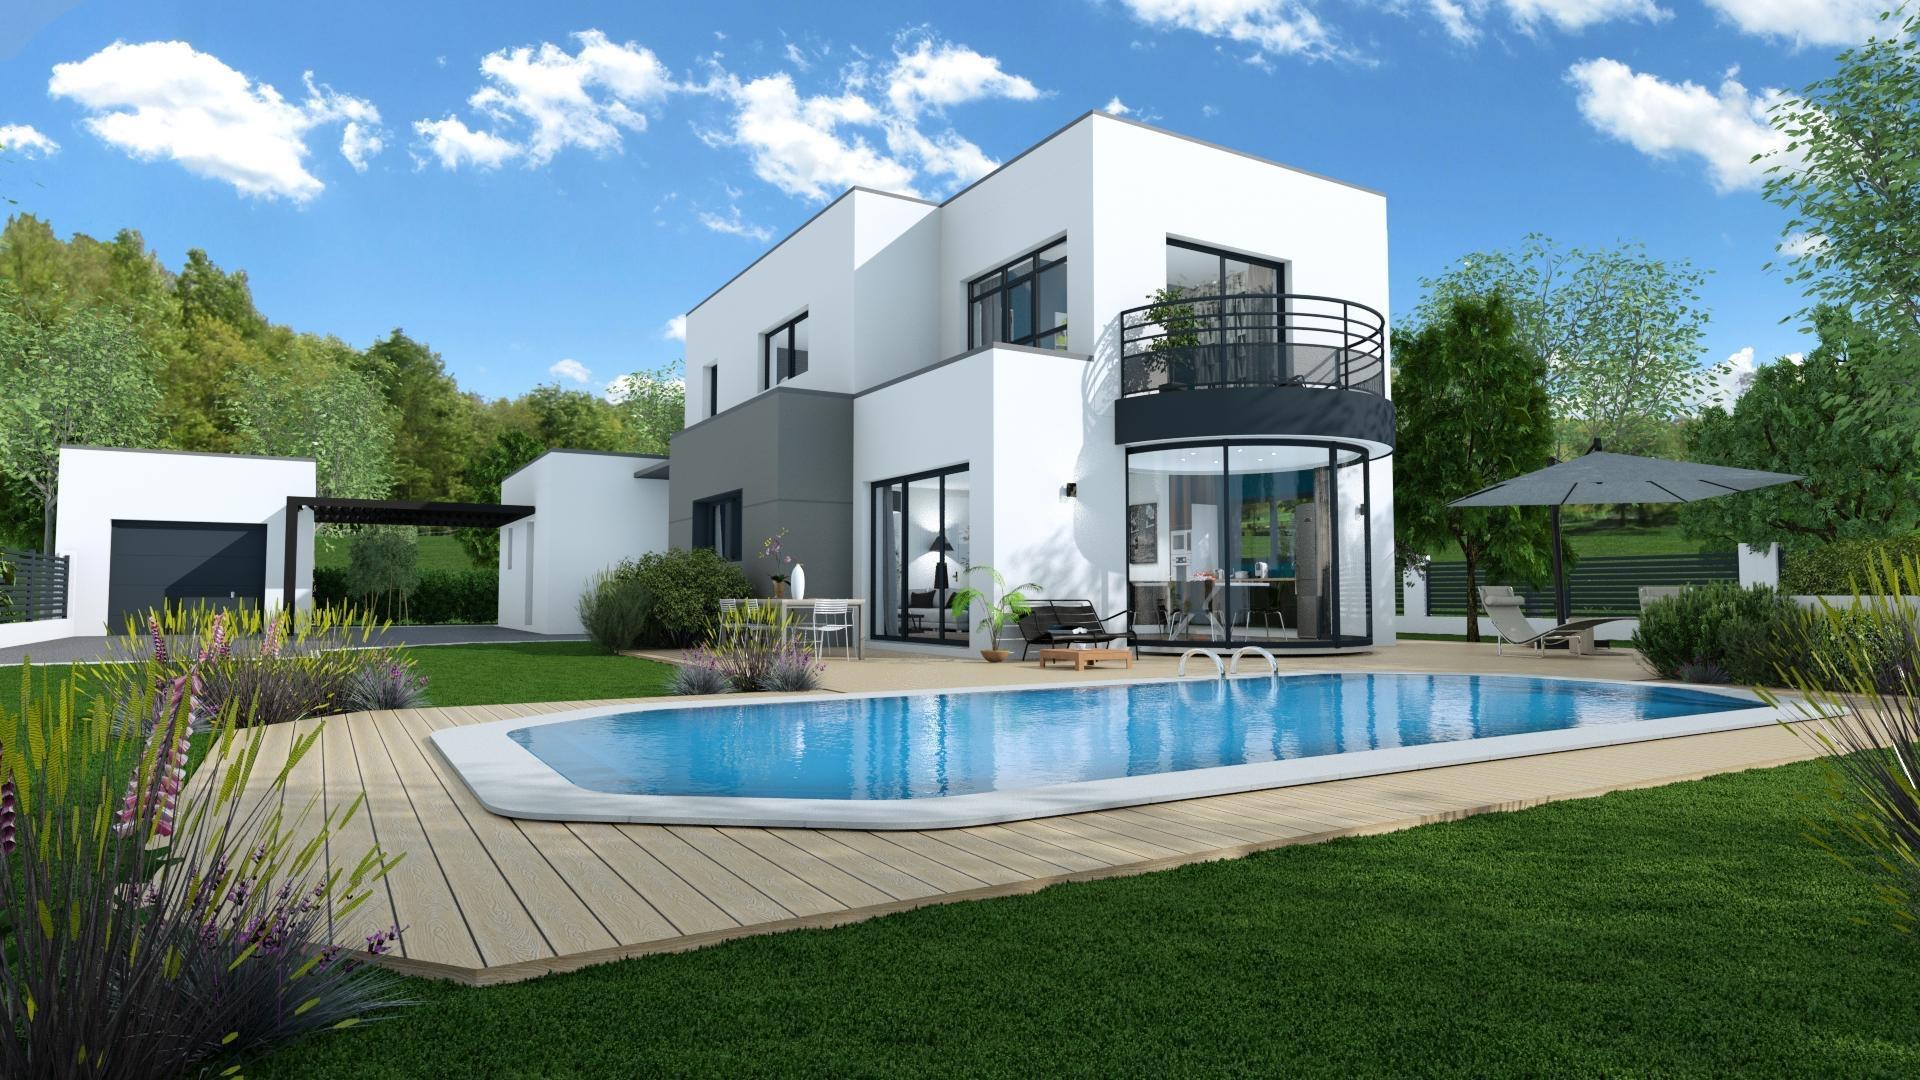 Post Up Your Renderings!-exterior_house_pool.jpg